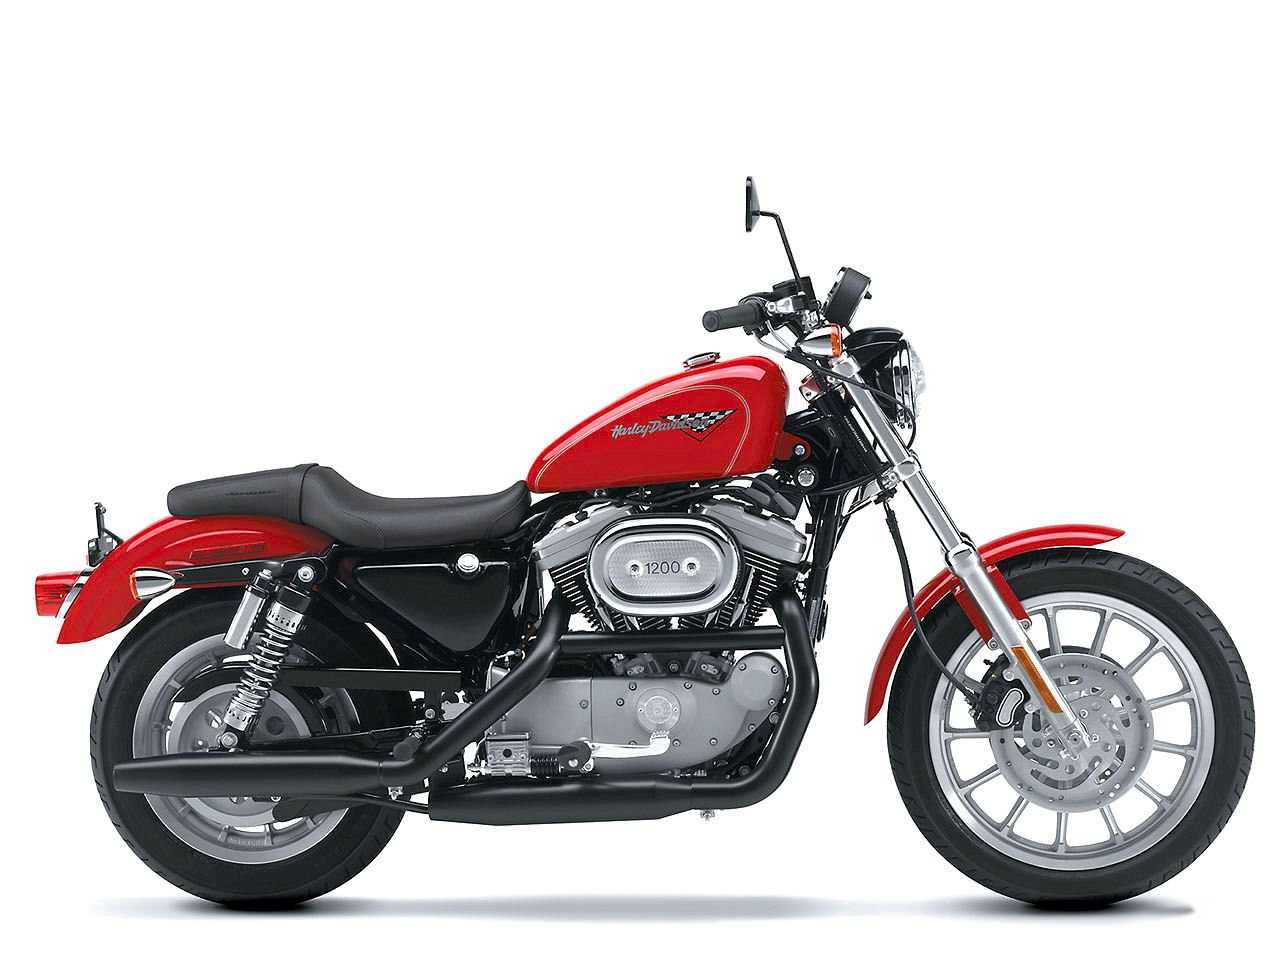 Harley Davidson Motorcycle Wallpaper Harley davidson